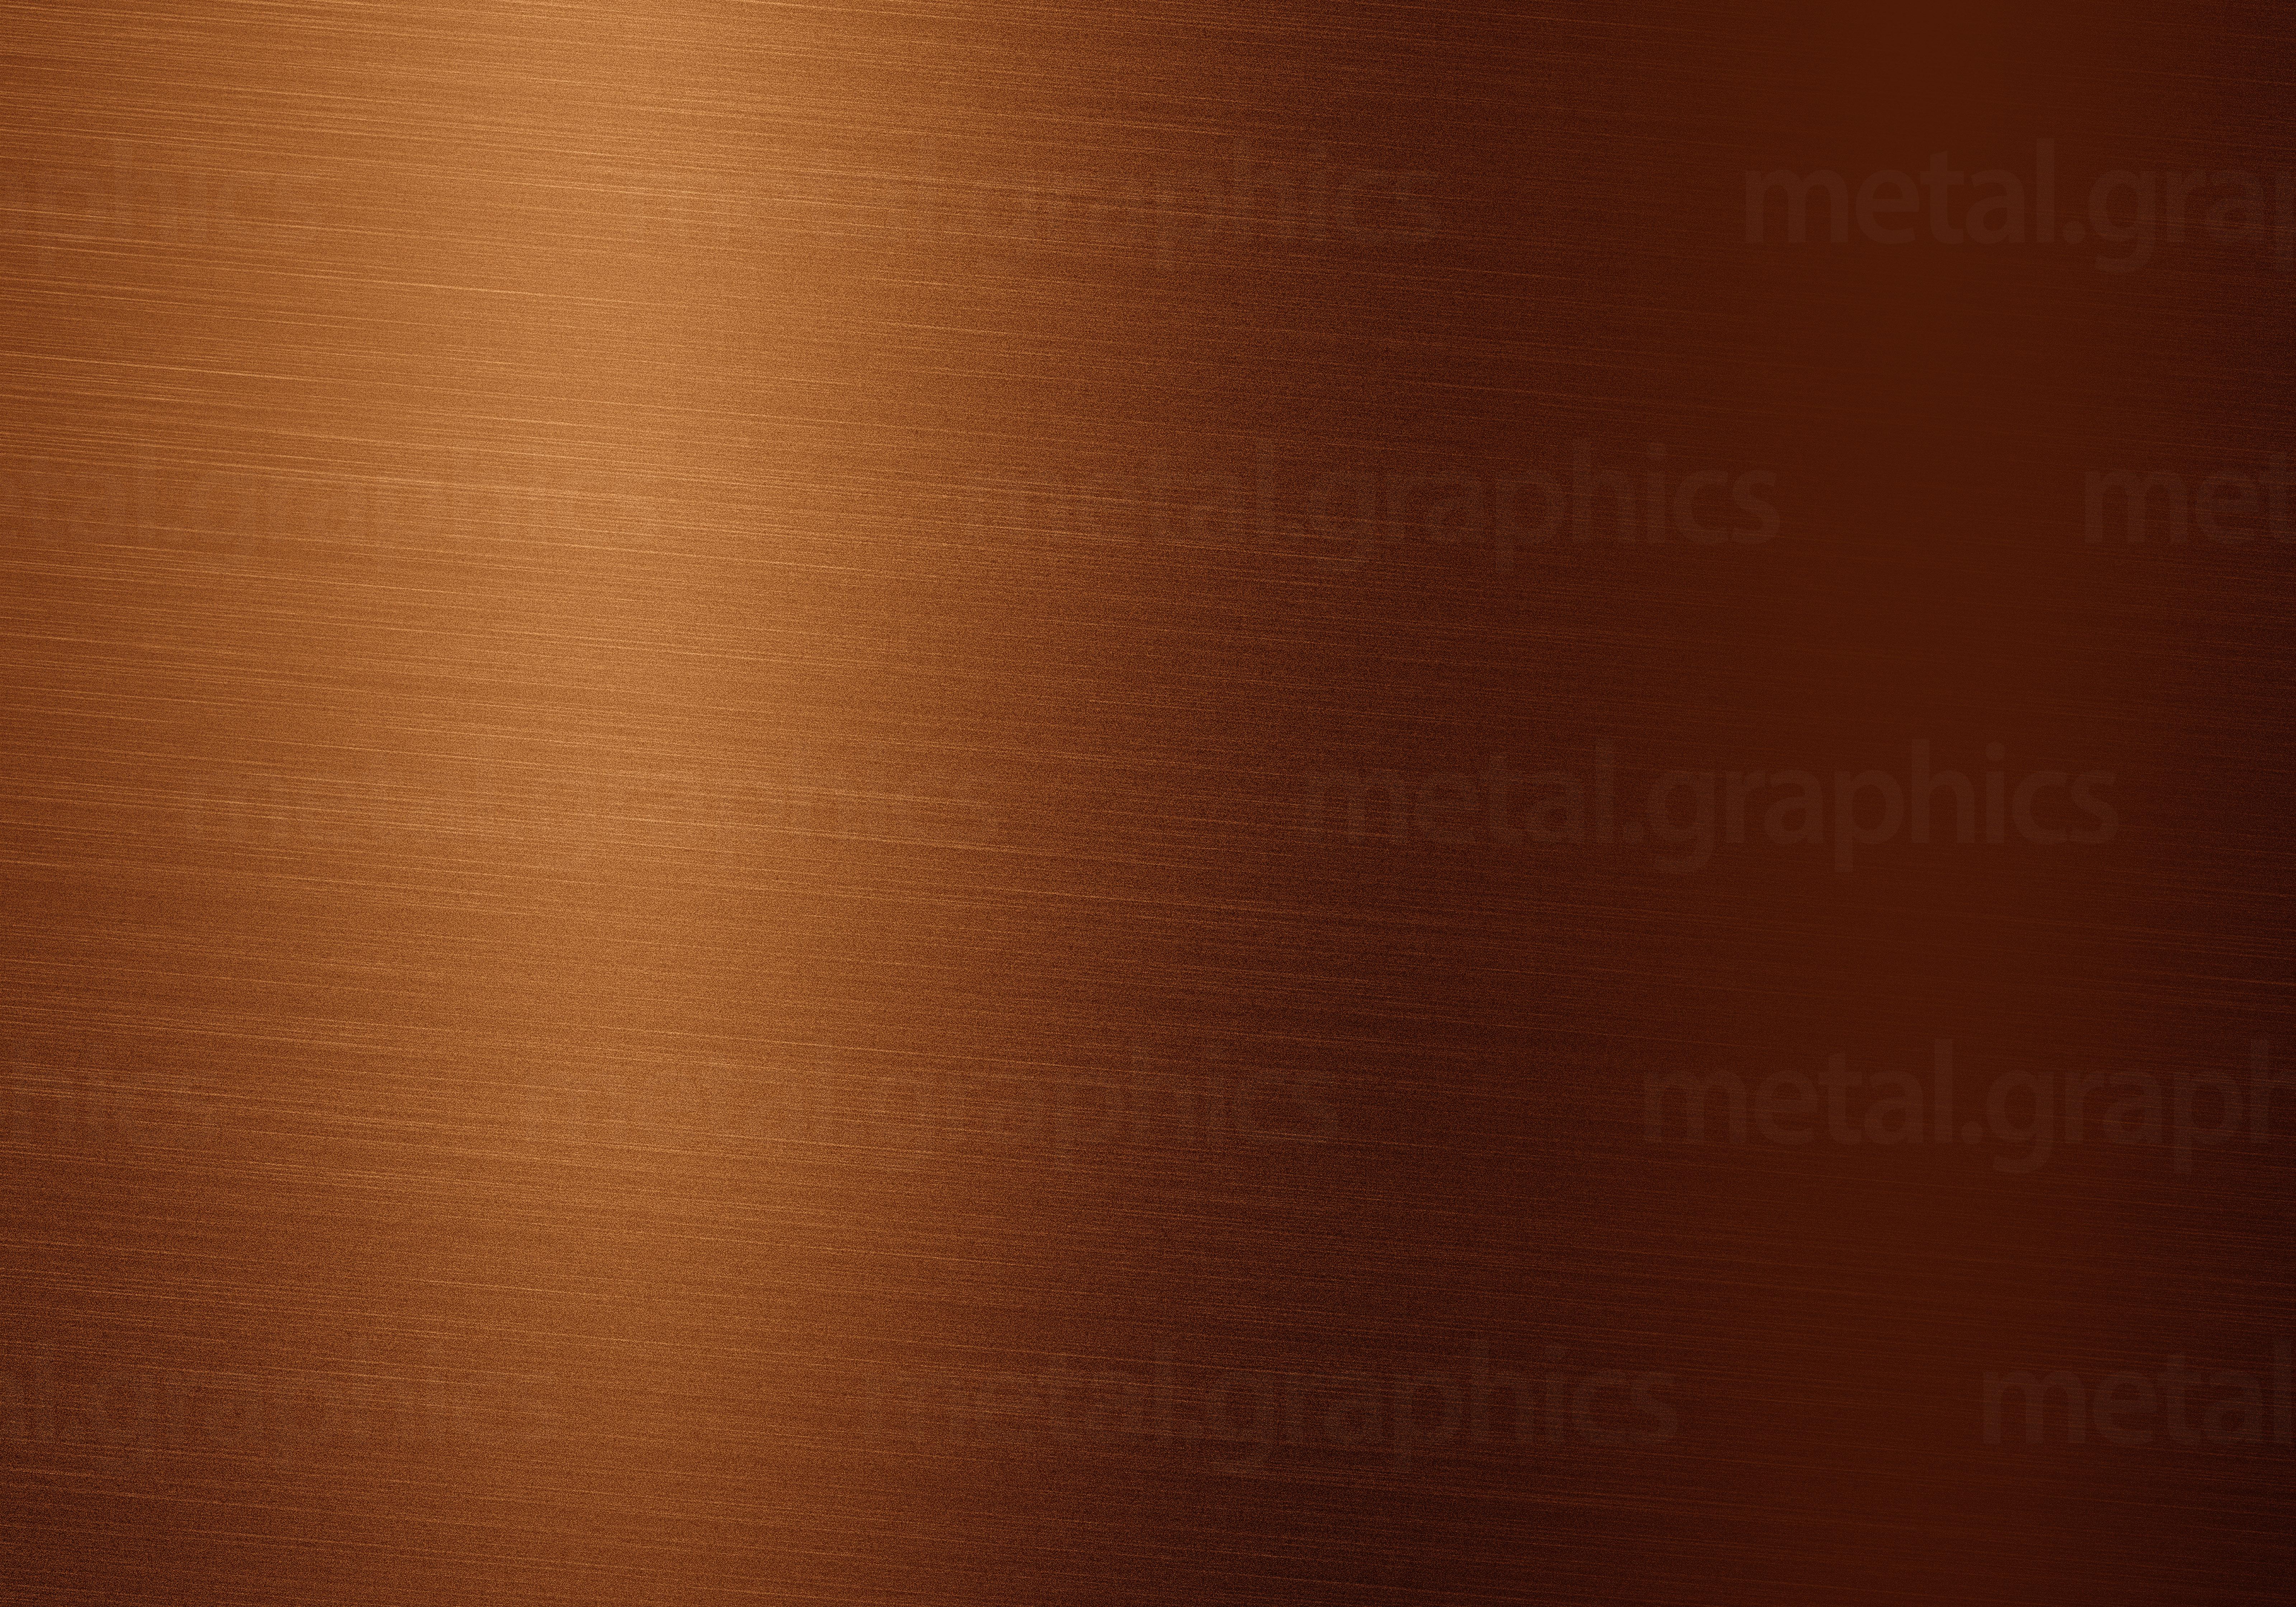 Brown background   Metal Graphics 6400x4480